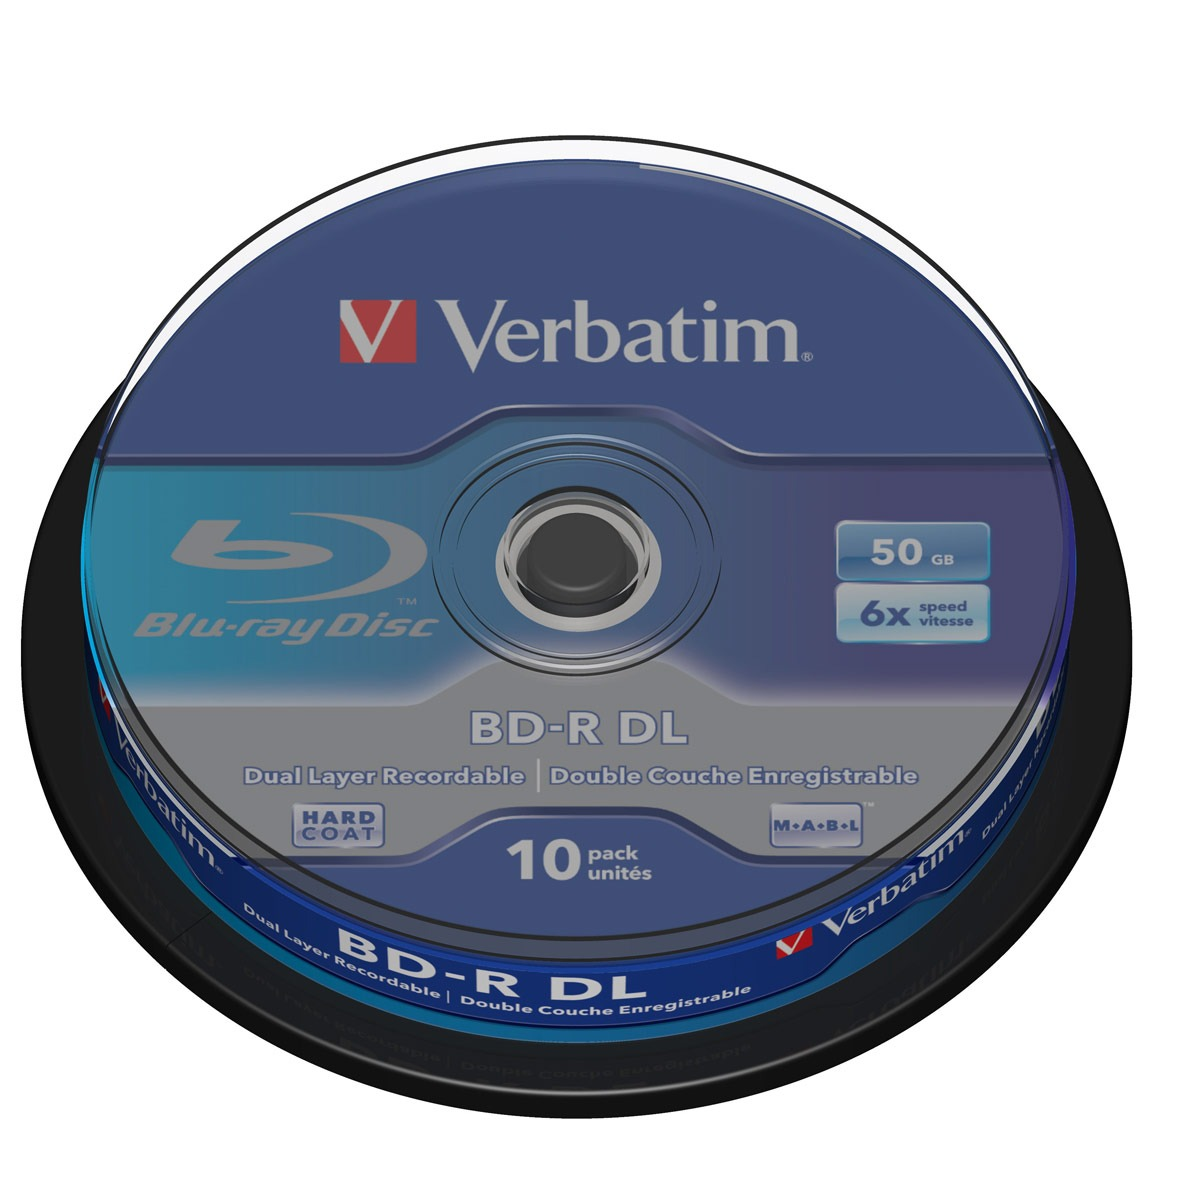 Blu-ray Verbatim BD-R DL 50 Go certifié 6x (pack de 10, spindle) Verbatim BD-R DL 50 Go certifié 6x (pack de 10, spindle)